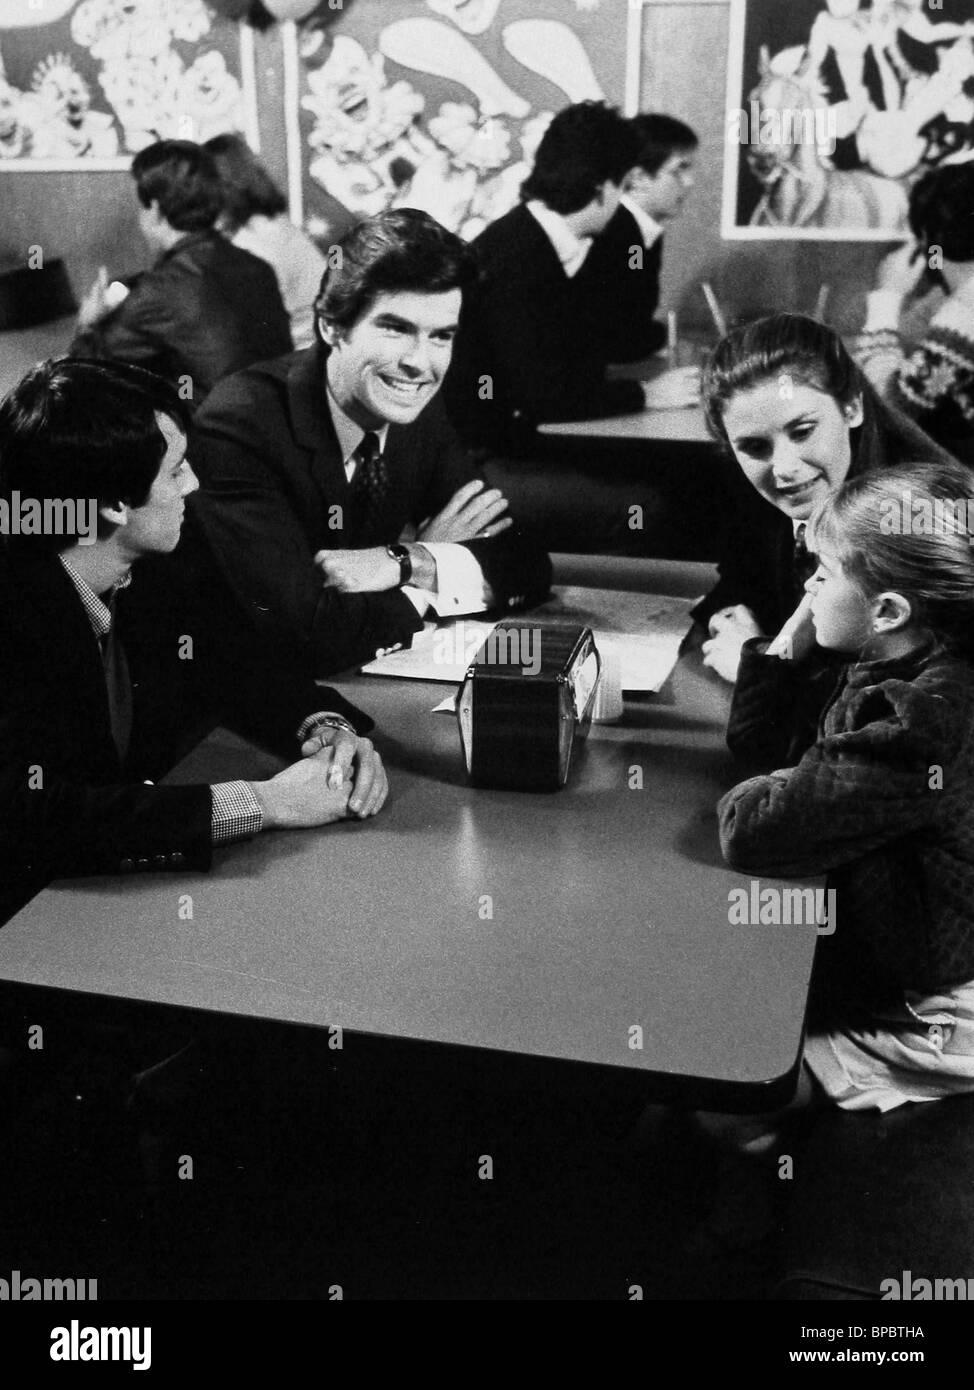 ERIC BROWN, Pierce Brosnan, Stephanie Zimbalist, BRIDGETTE ANDERSEN, Remington Steele, 1982 Foto de stock